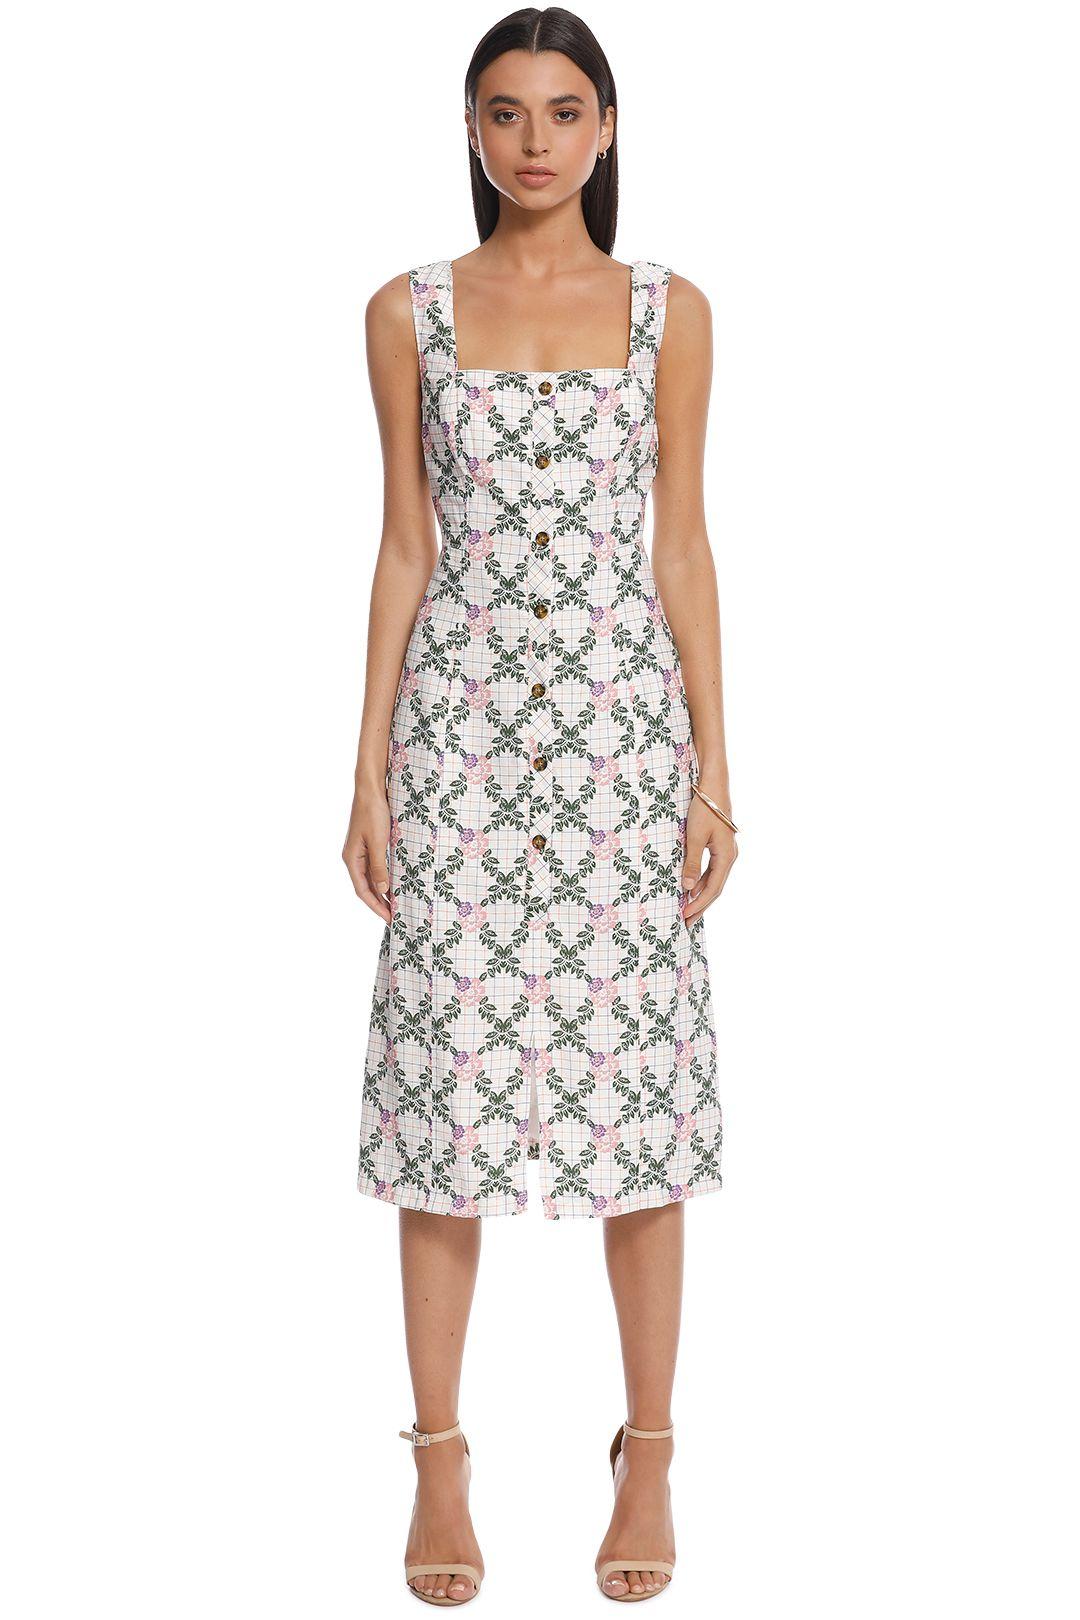 The East Order - Tarshie Midi Dress - Back